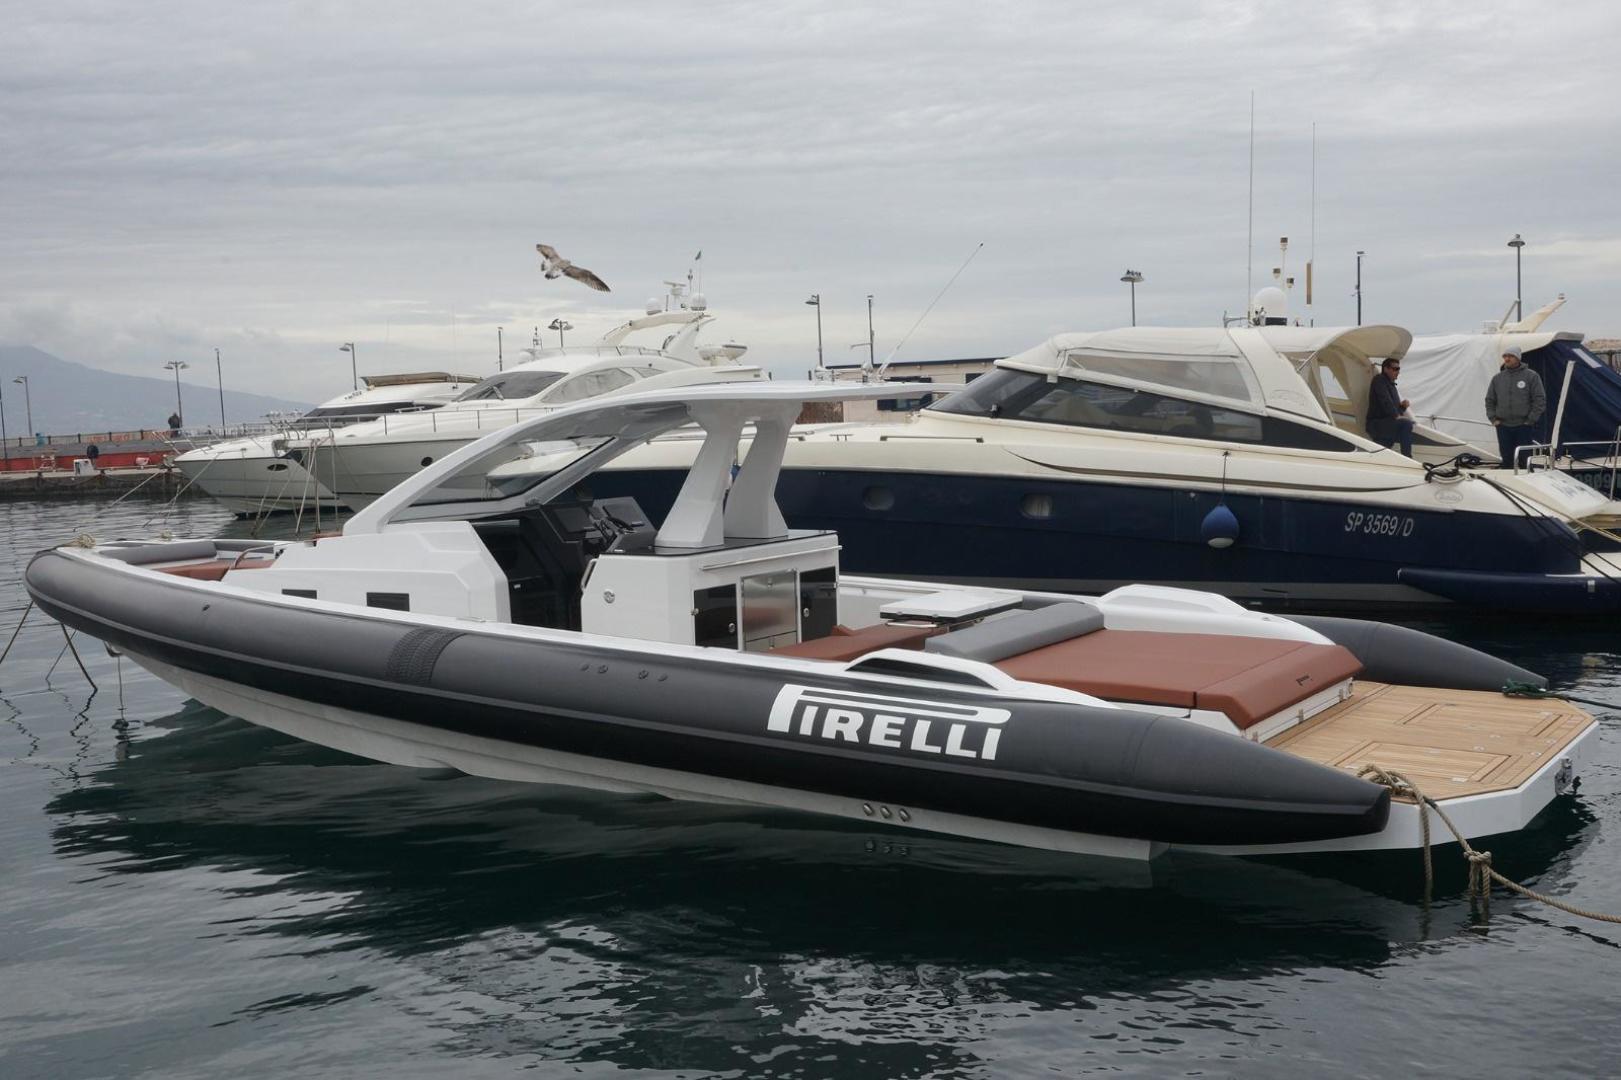 Pirelli-PZero 1250 2020-Pzero 1250 Fort Lauderdale-Florida-United States-1549637   Thumbnail